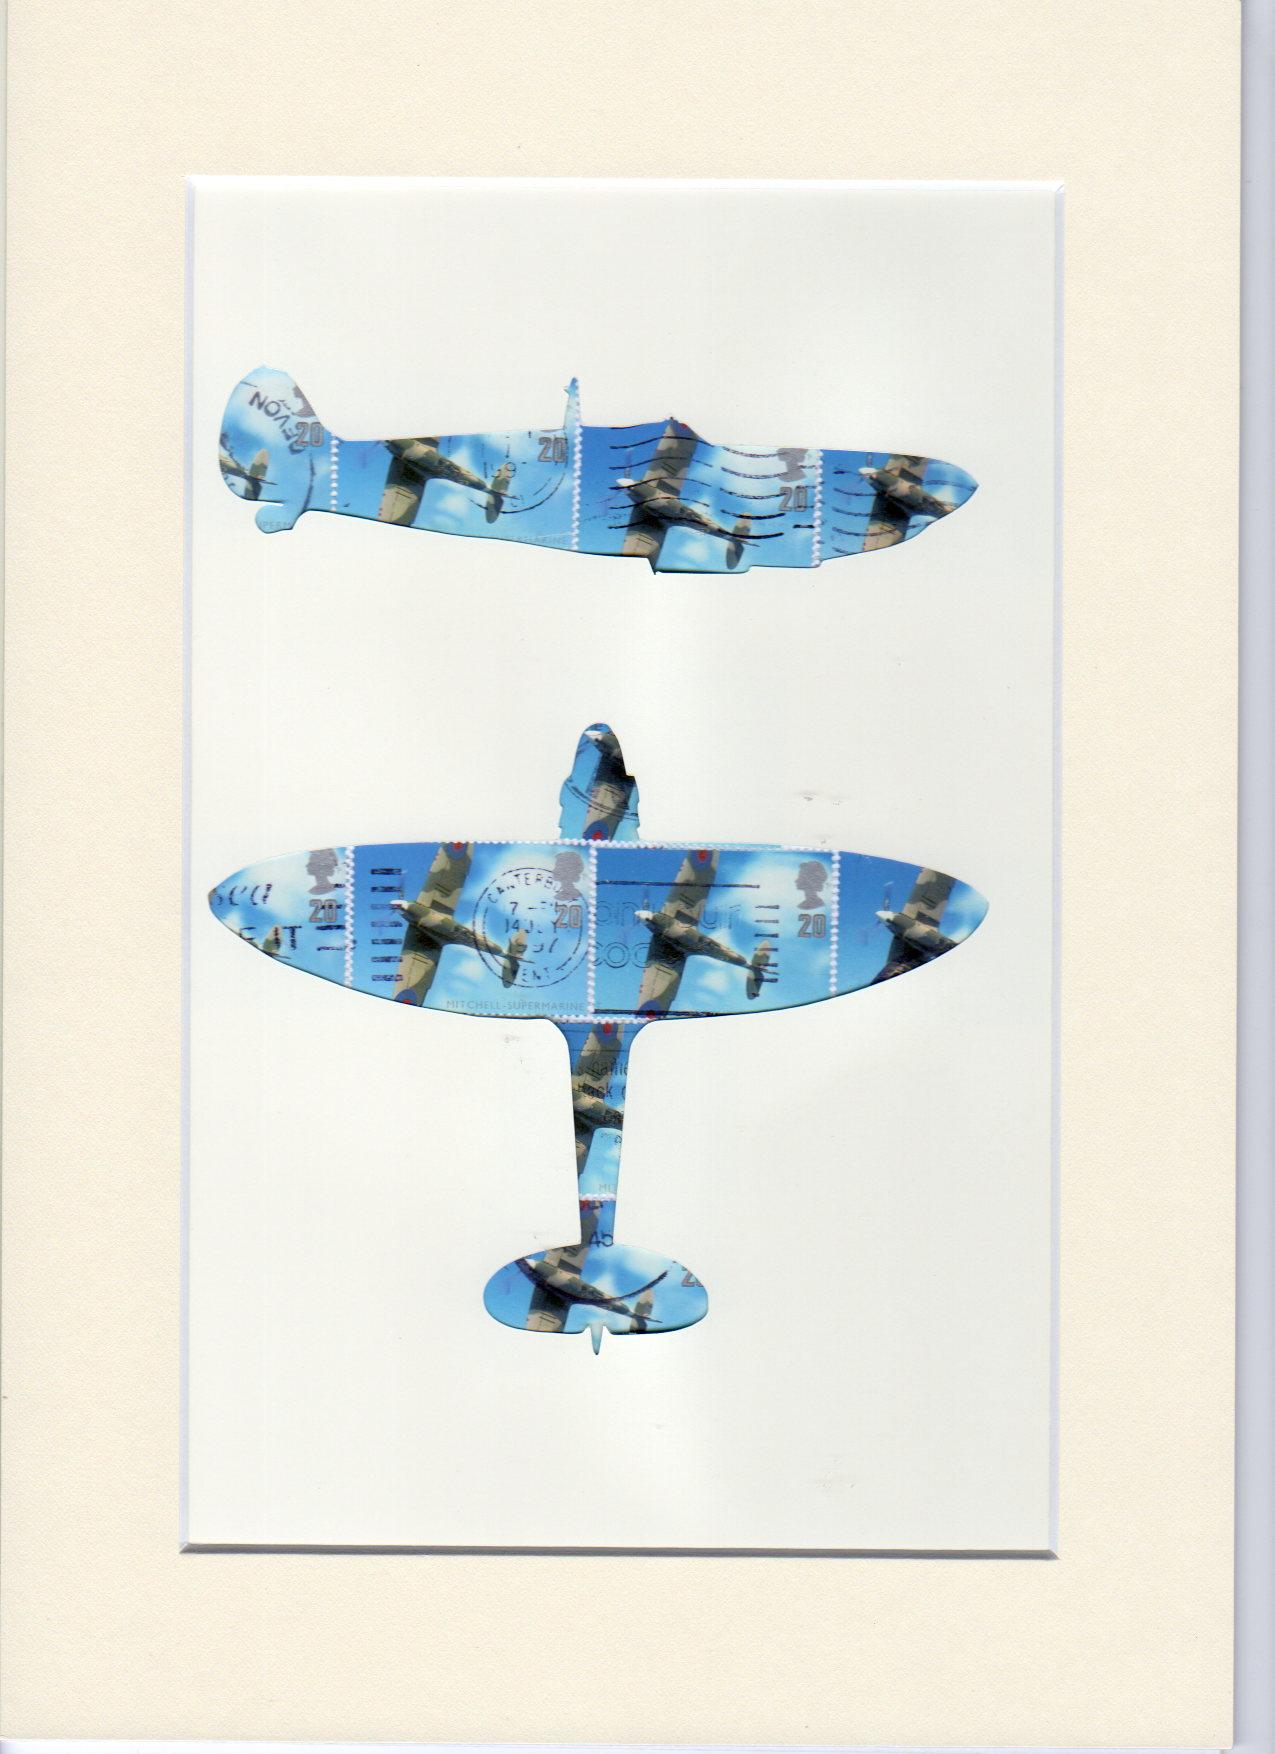 spitfire2014007.jpg